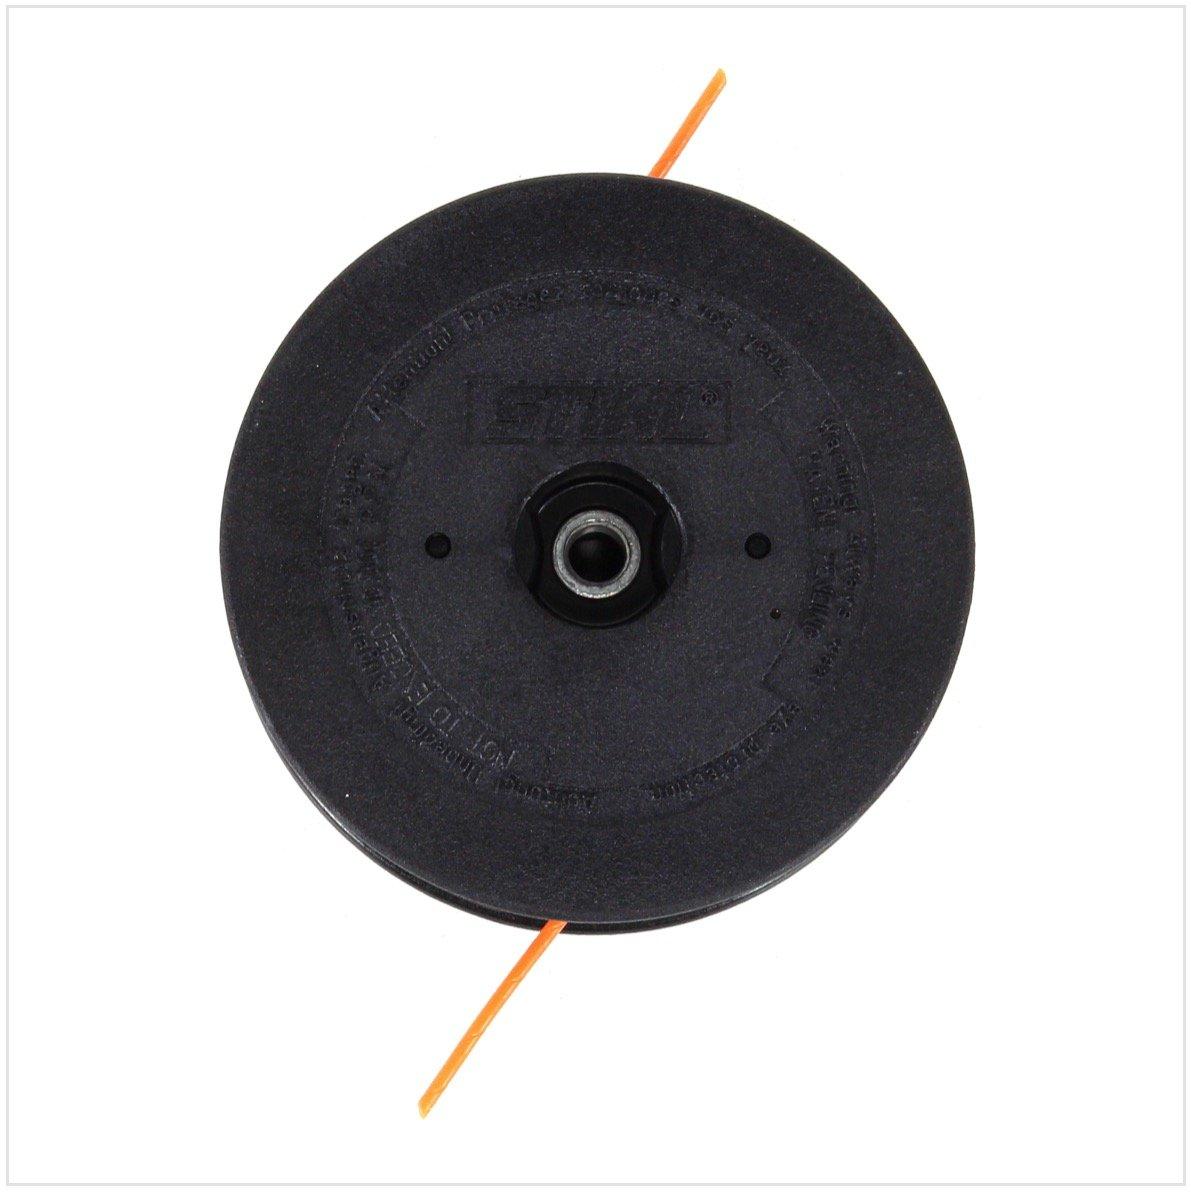 Stihl 40027102162 Superpercut 20-2 FS55,65,80,85,87,120 4002 710 2162 - Cabezal de corte